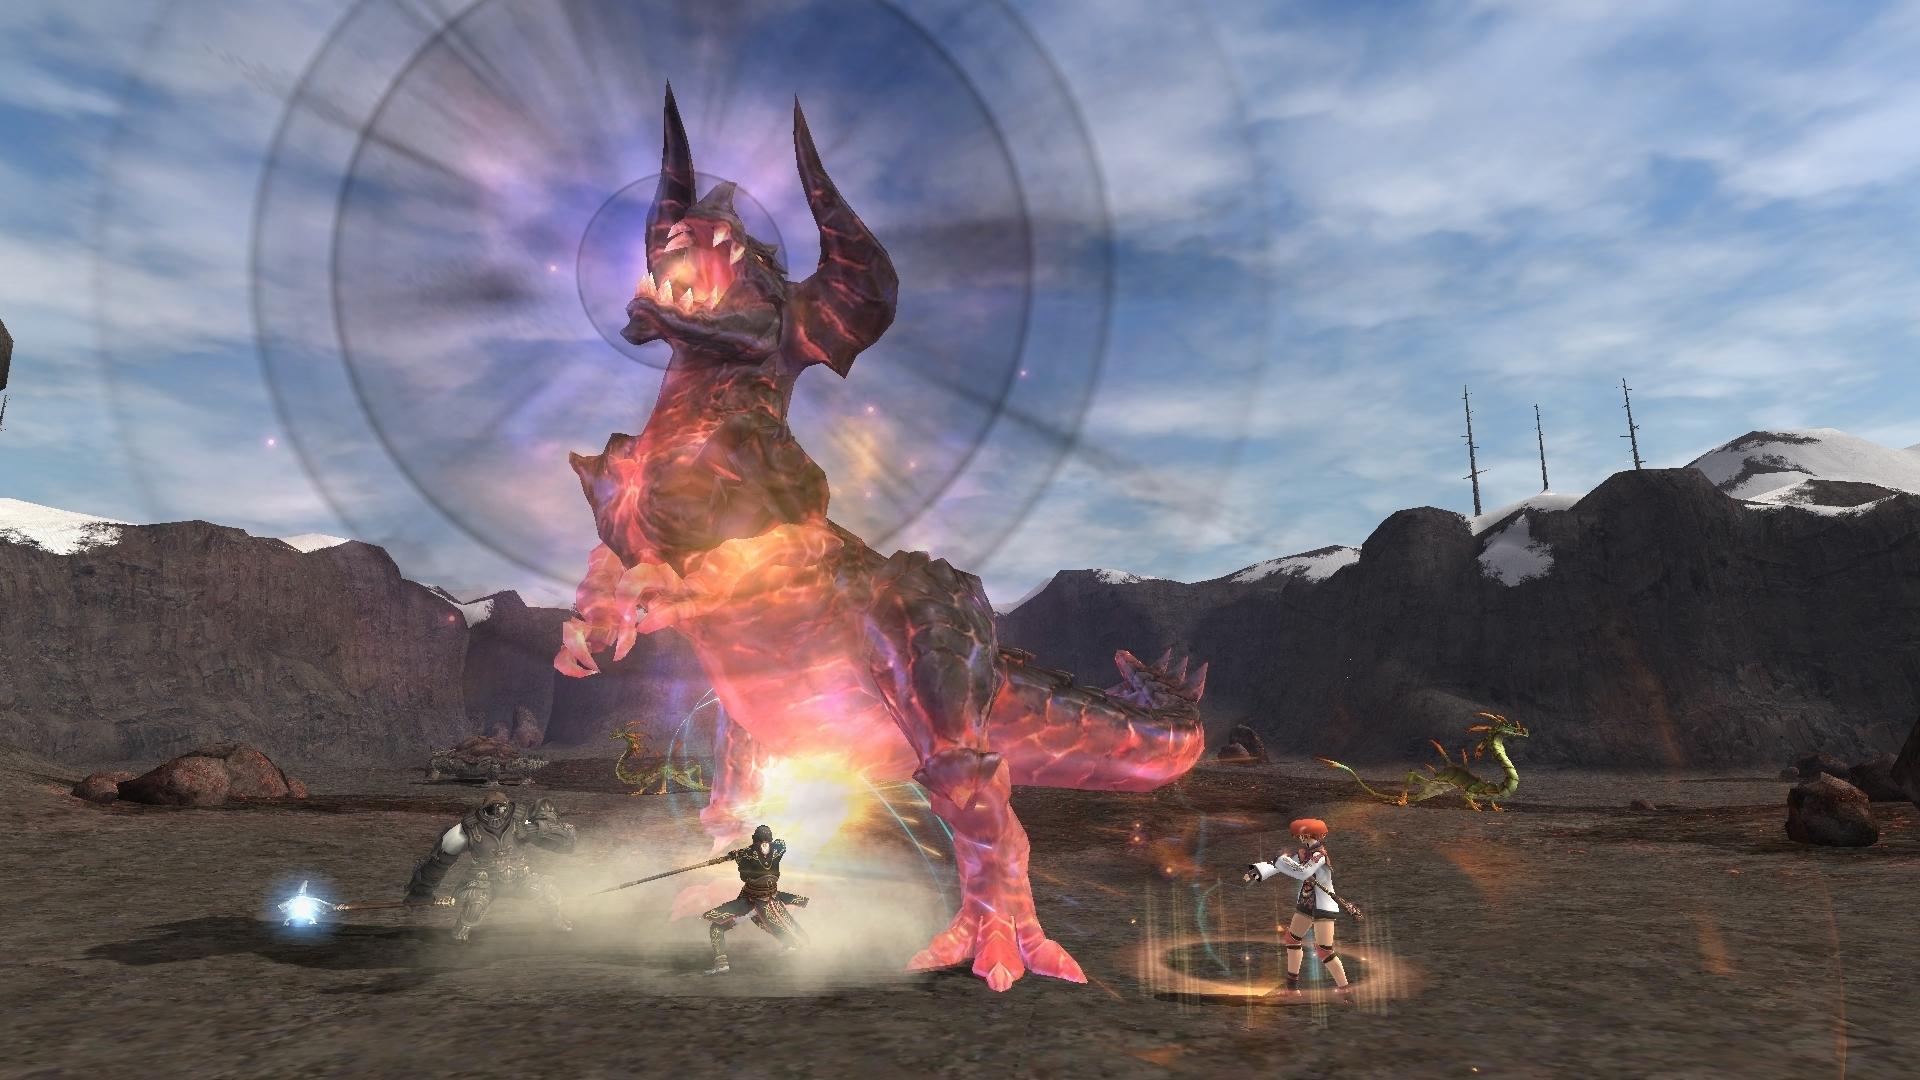 FINAL FANTASY® XI: FREE TRIAL [PC Download] | Square Enix